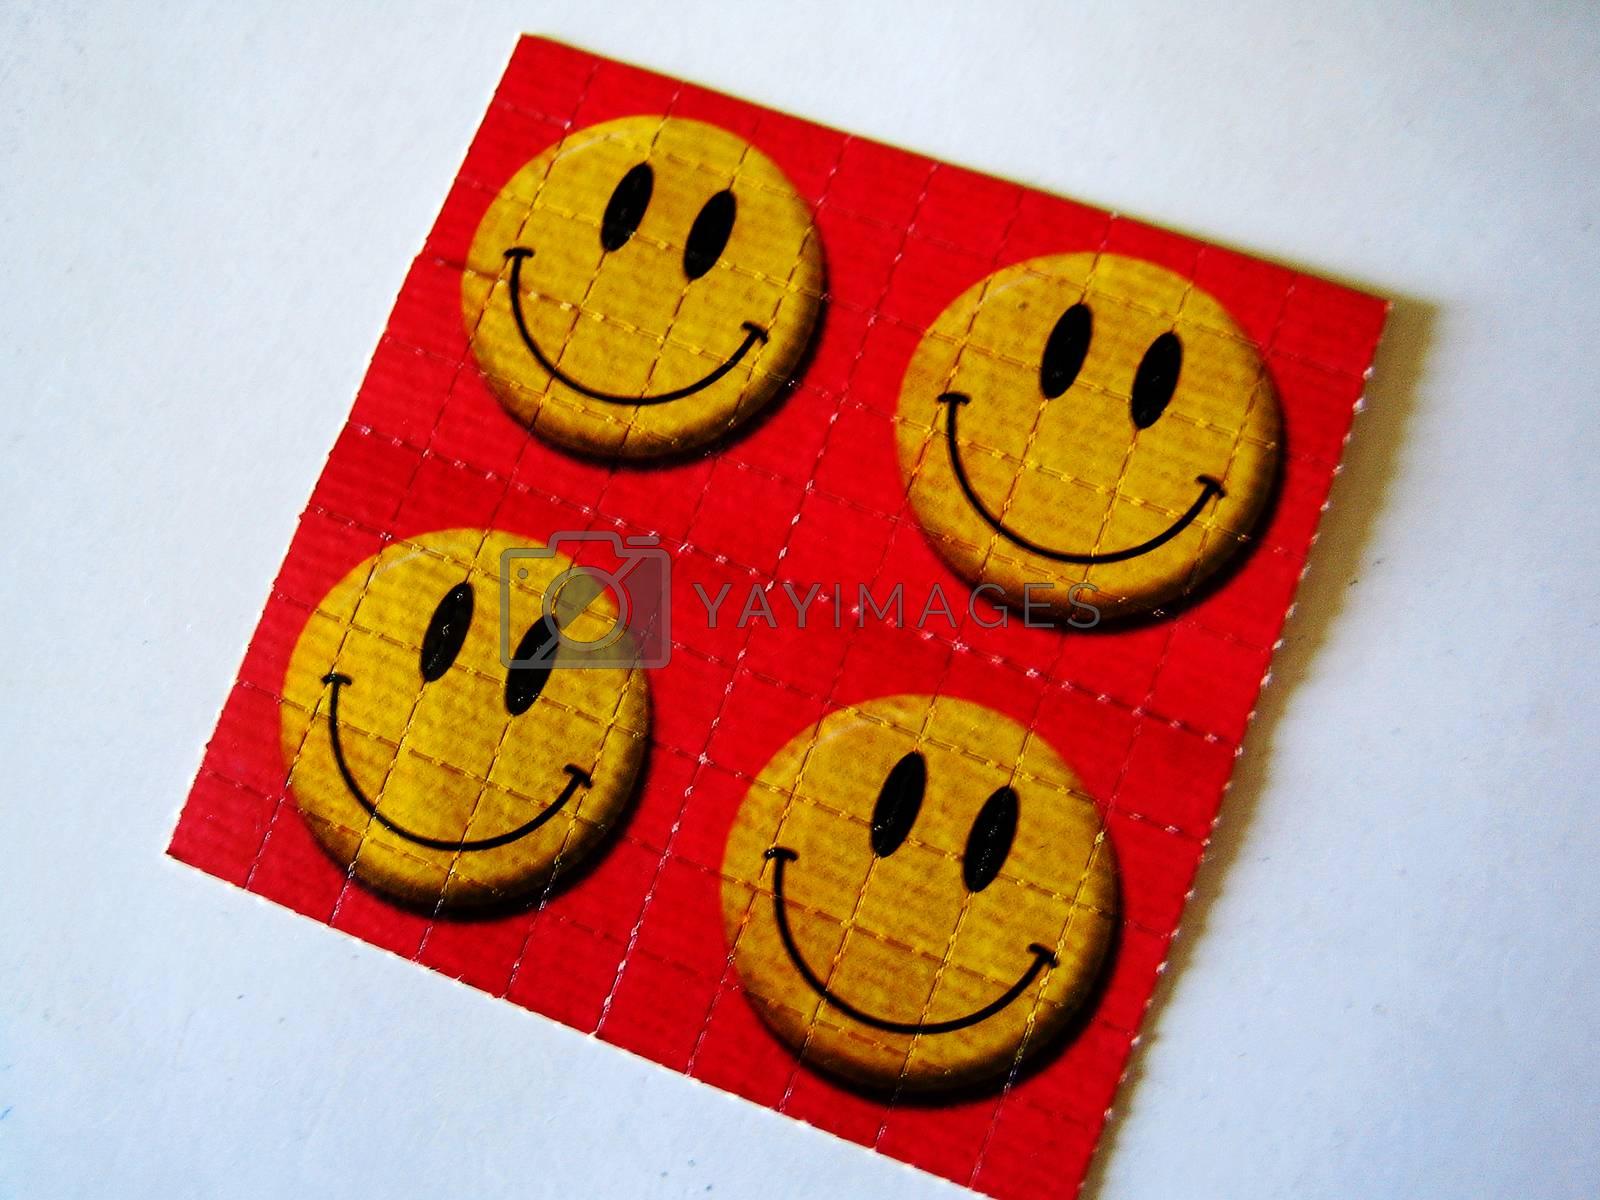 Smiley face sticker ls d tongue background fine art wallpaper